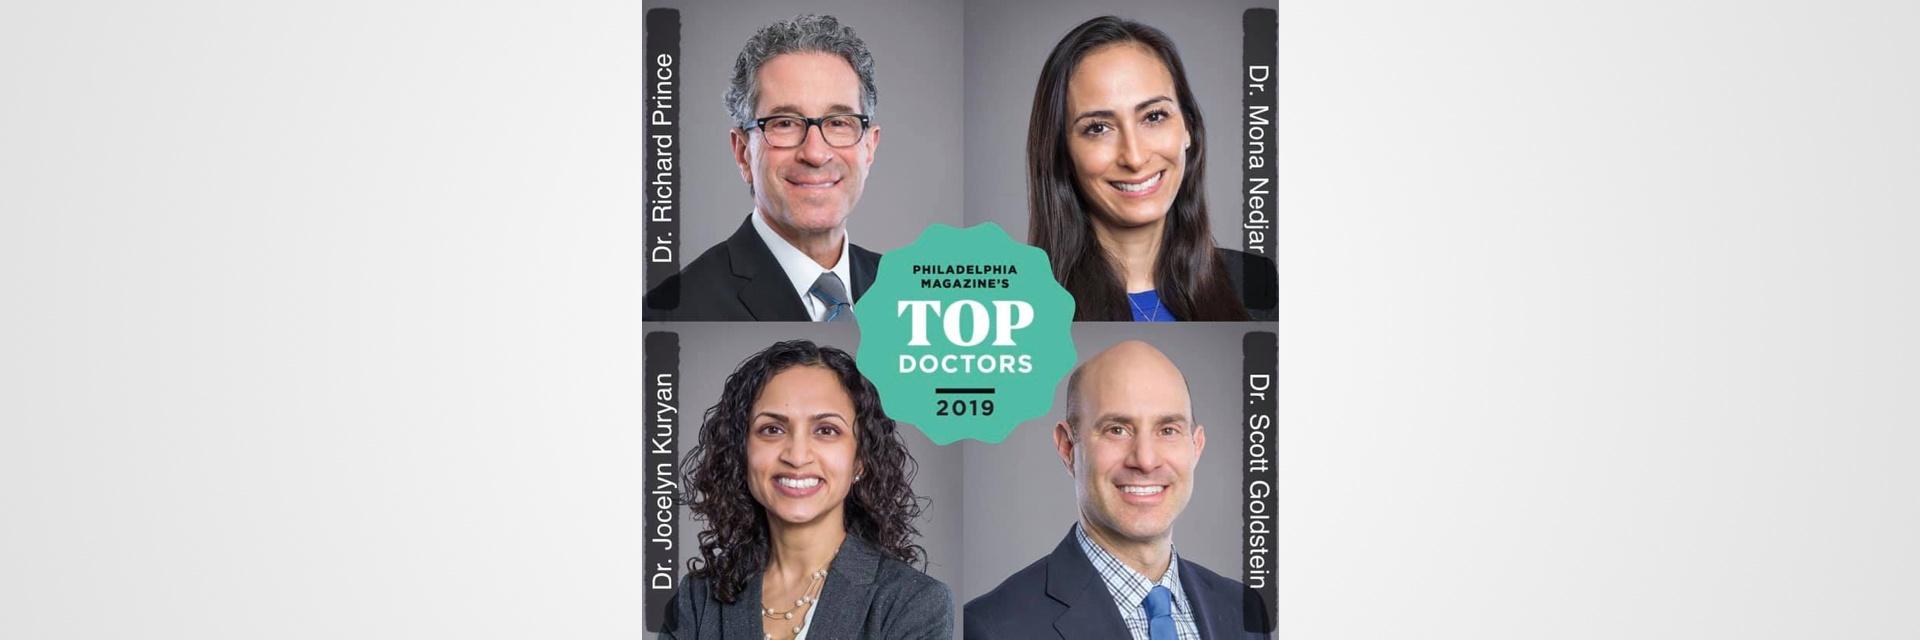 Philadelphia Magazine's Top Doctors™ 2019 in Ophthalmology - Tri-Century Eye Care